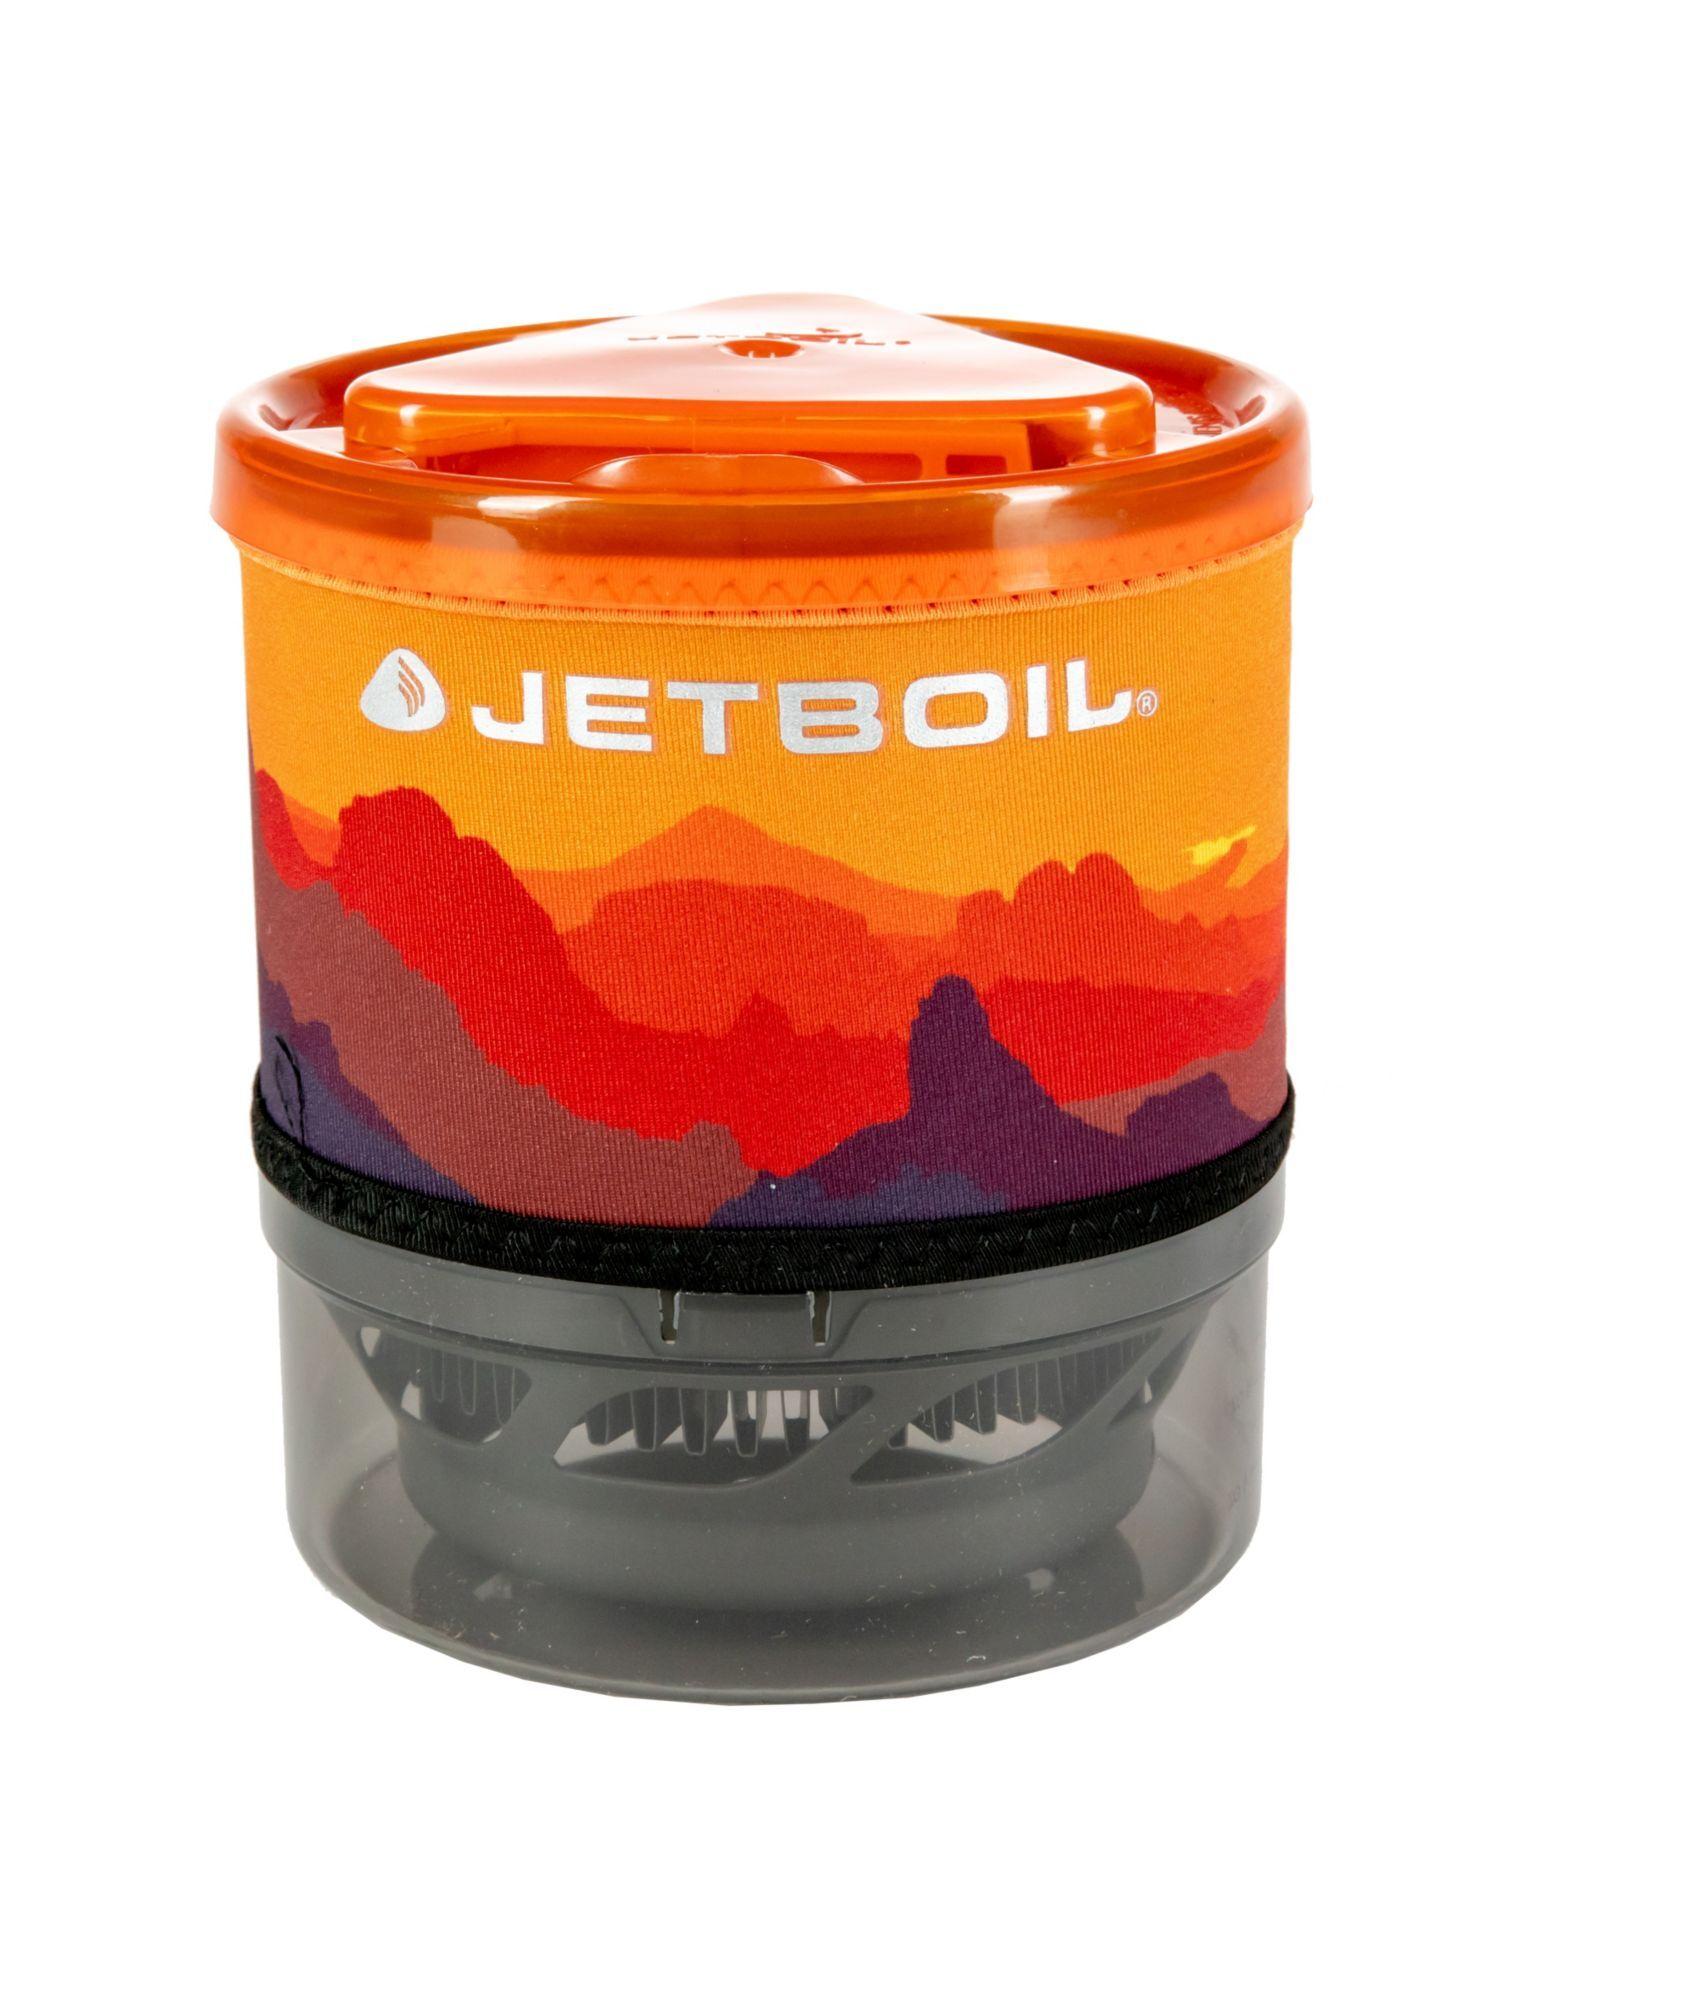 Jetboil MiniMo Cooking System, Orange